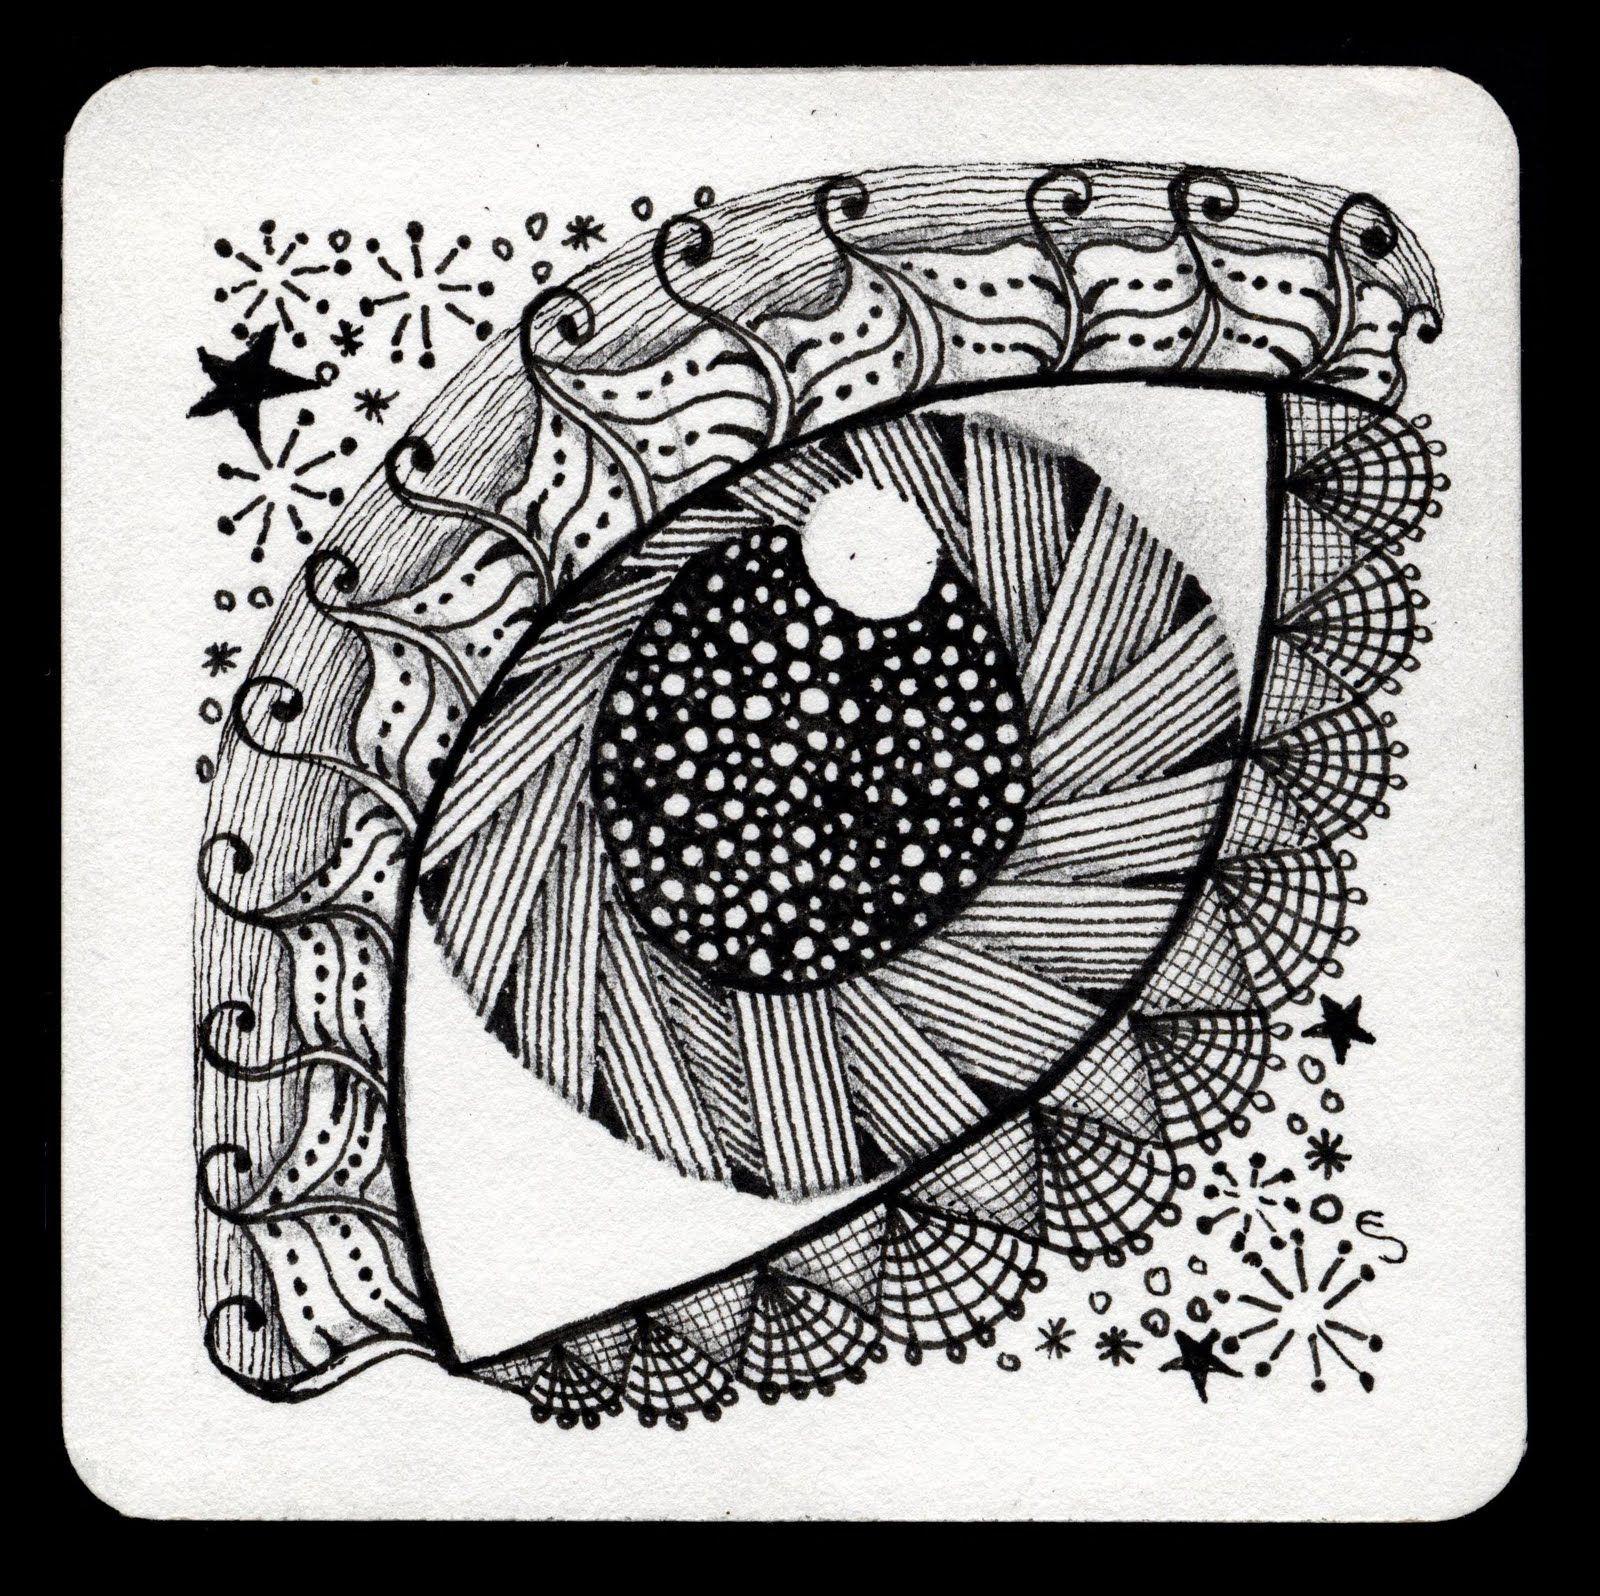 Free Print Zentangle Patterns | ve also had fun creating ...